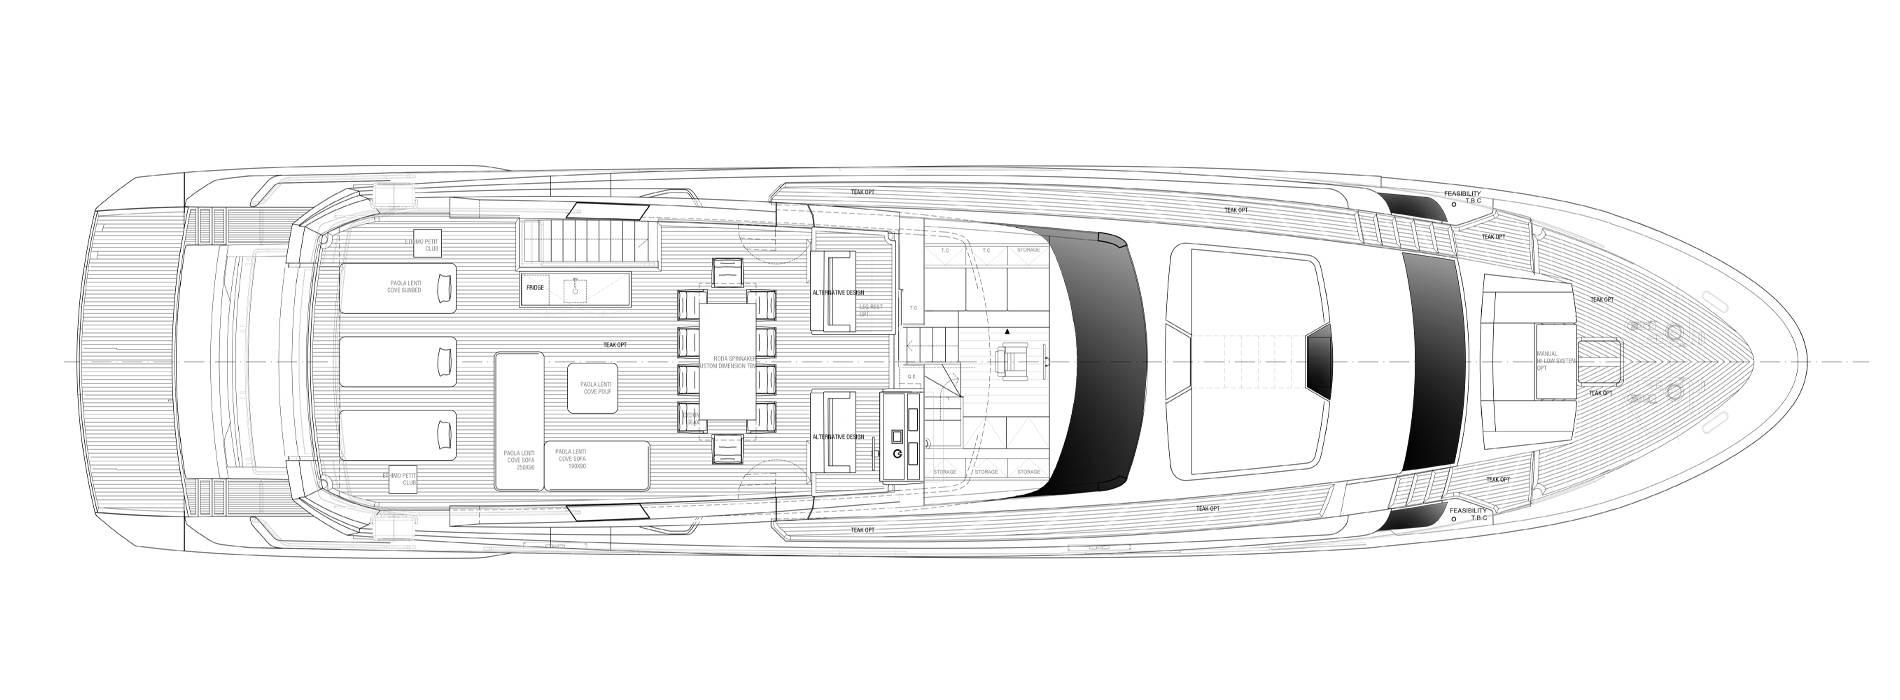 Sanlorenzo Yachts SL102A-746 under offer Flying bridge